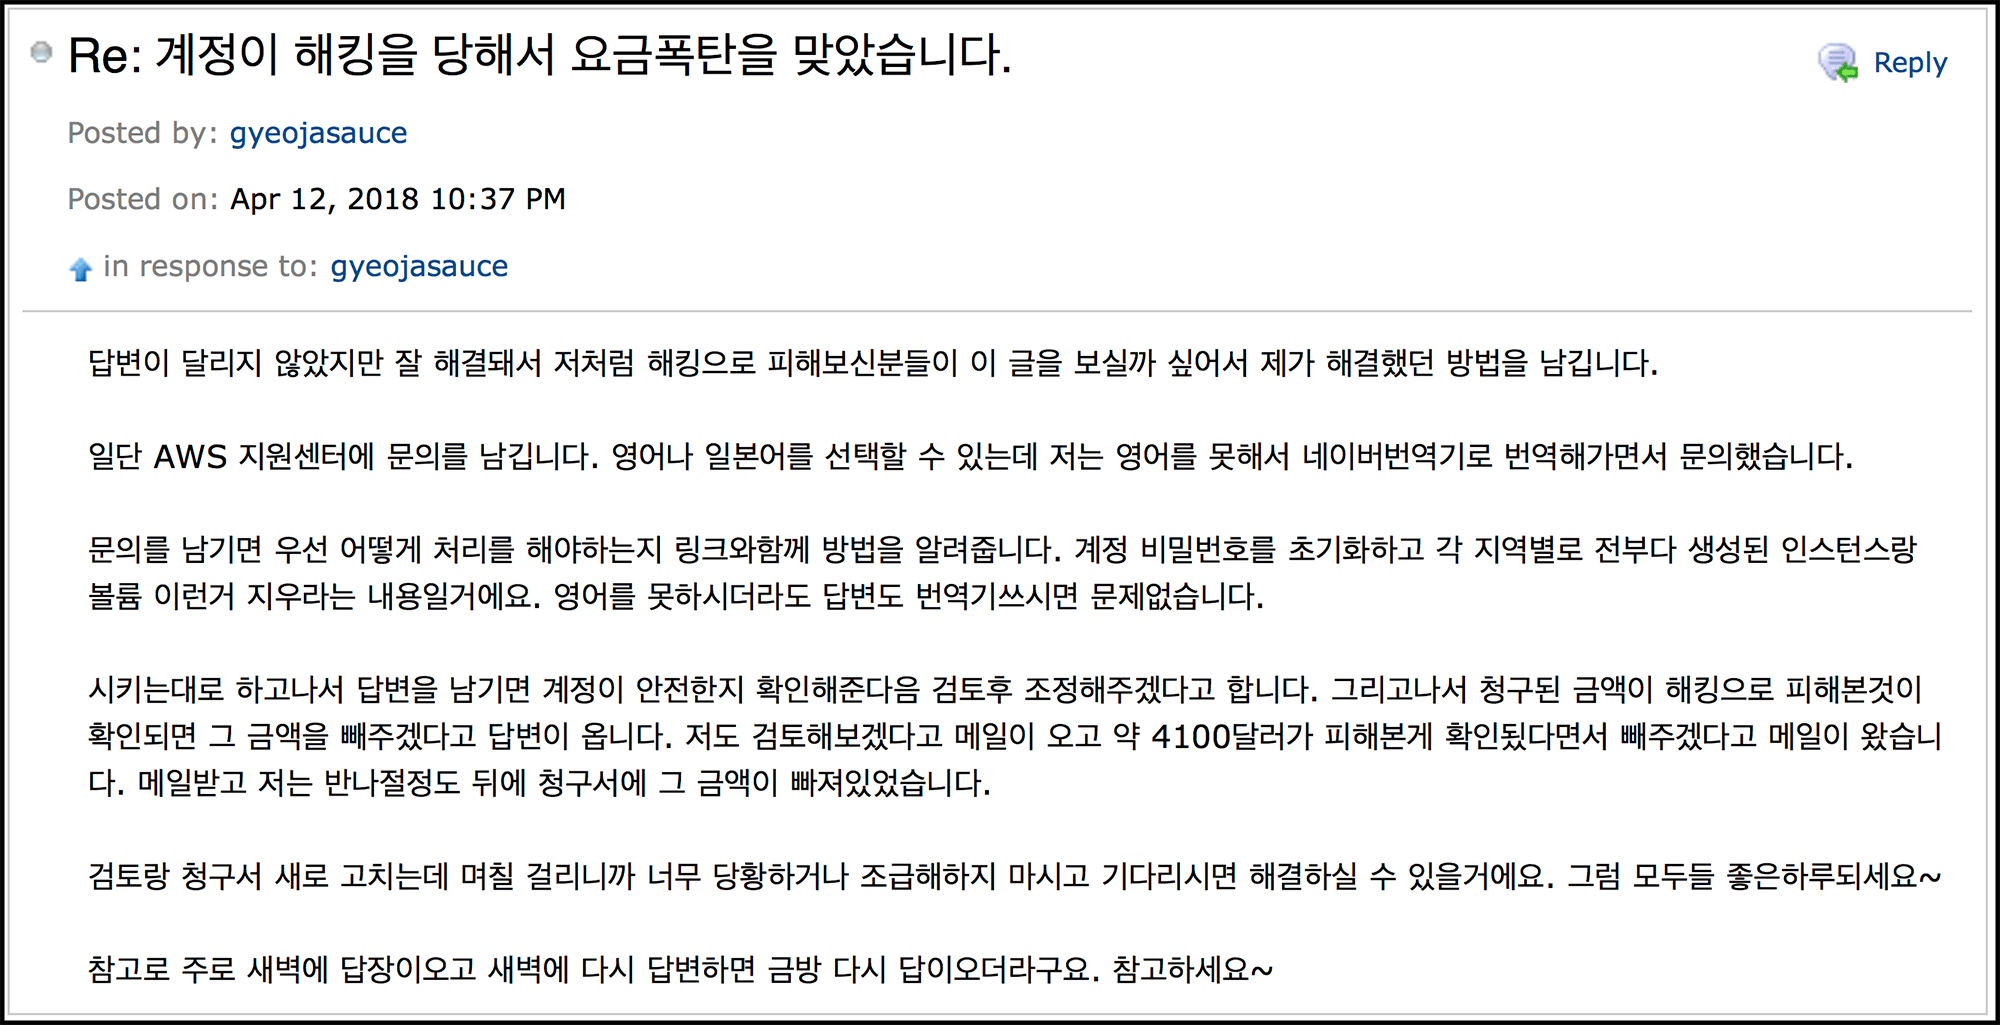 AWS 지원센터에 영어나 일본어, 또는 번역기를 통해 문의 했더니 해결했다는 답변자의 글